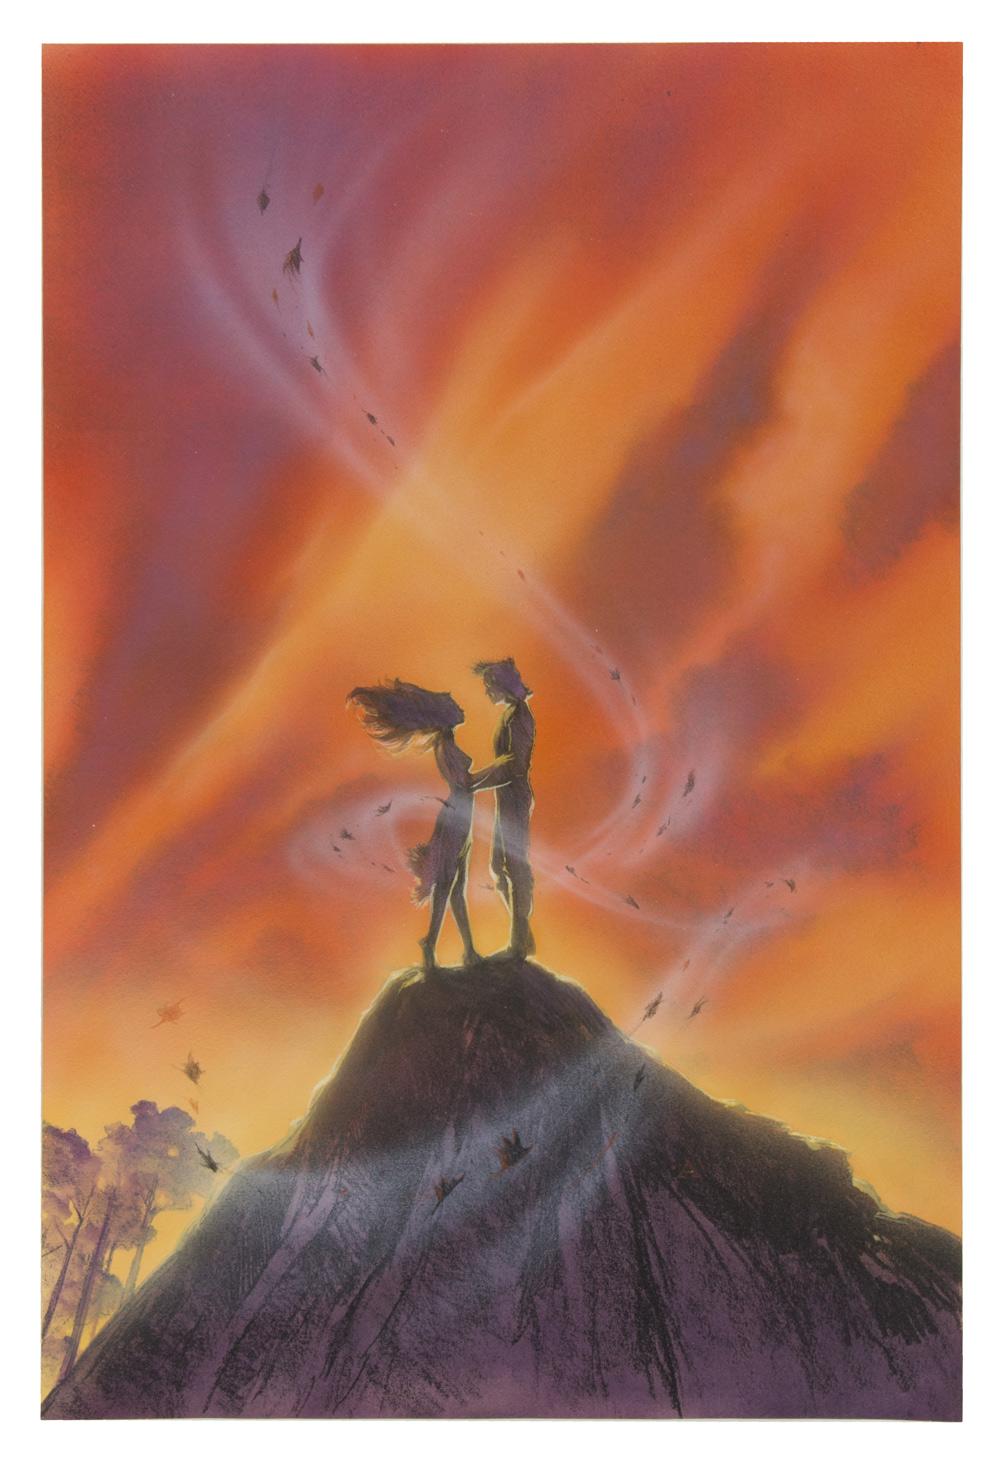 Pocahontas, by John Alvin